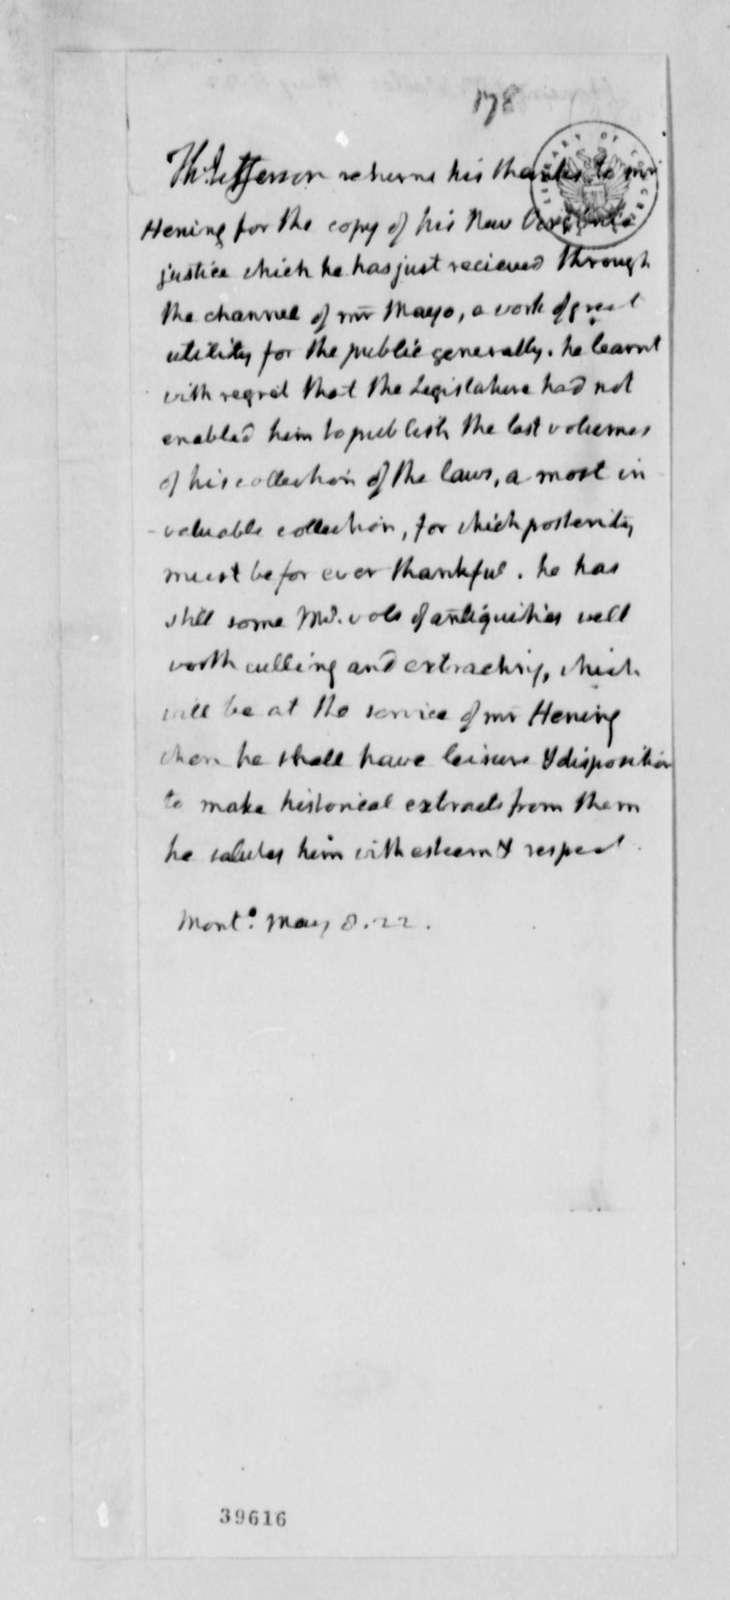 Thomas Jefferson to William Waller Hening, May 8, 1822